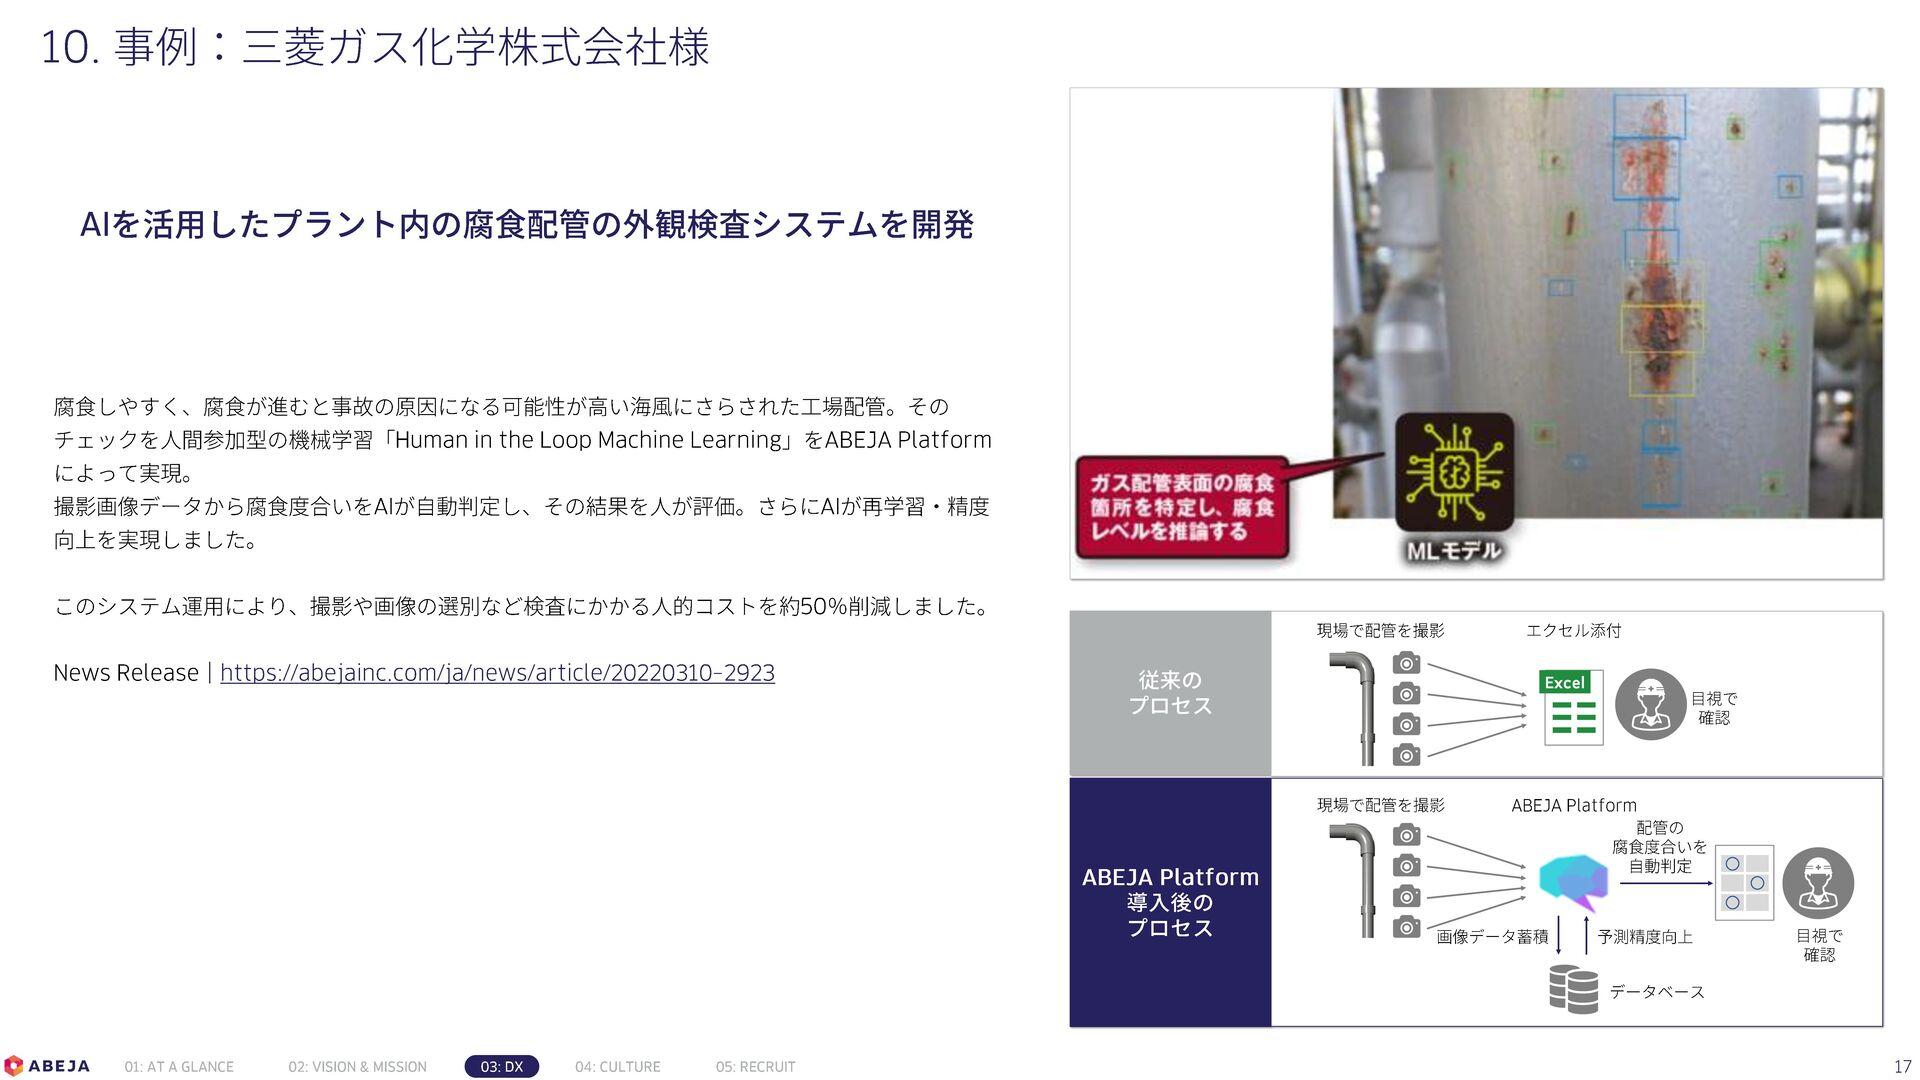 Confidential AIプロダクト事業部(ABEJA Platform) 17